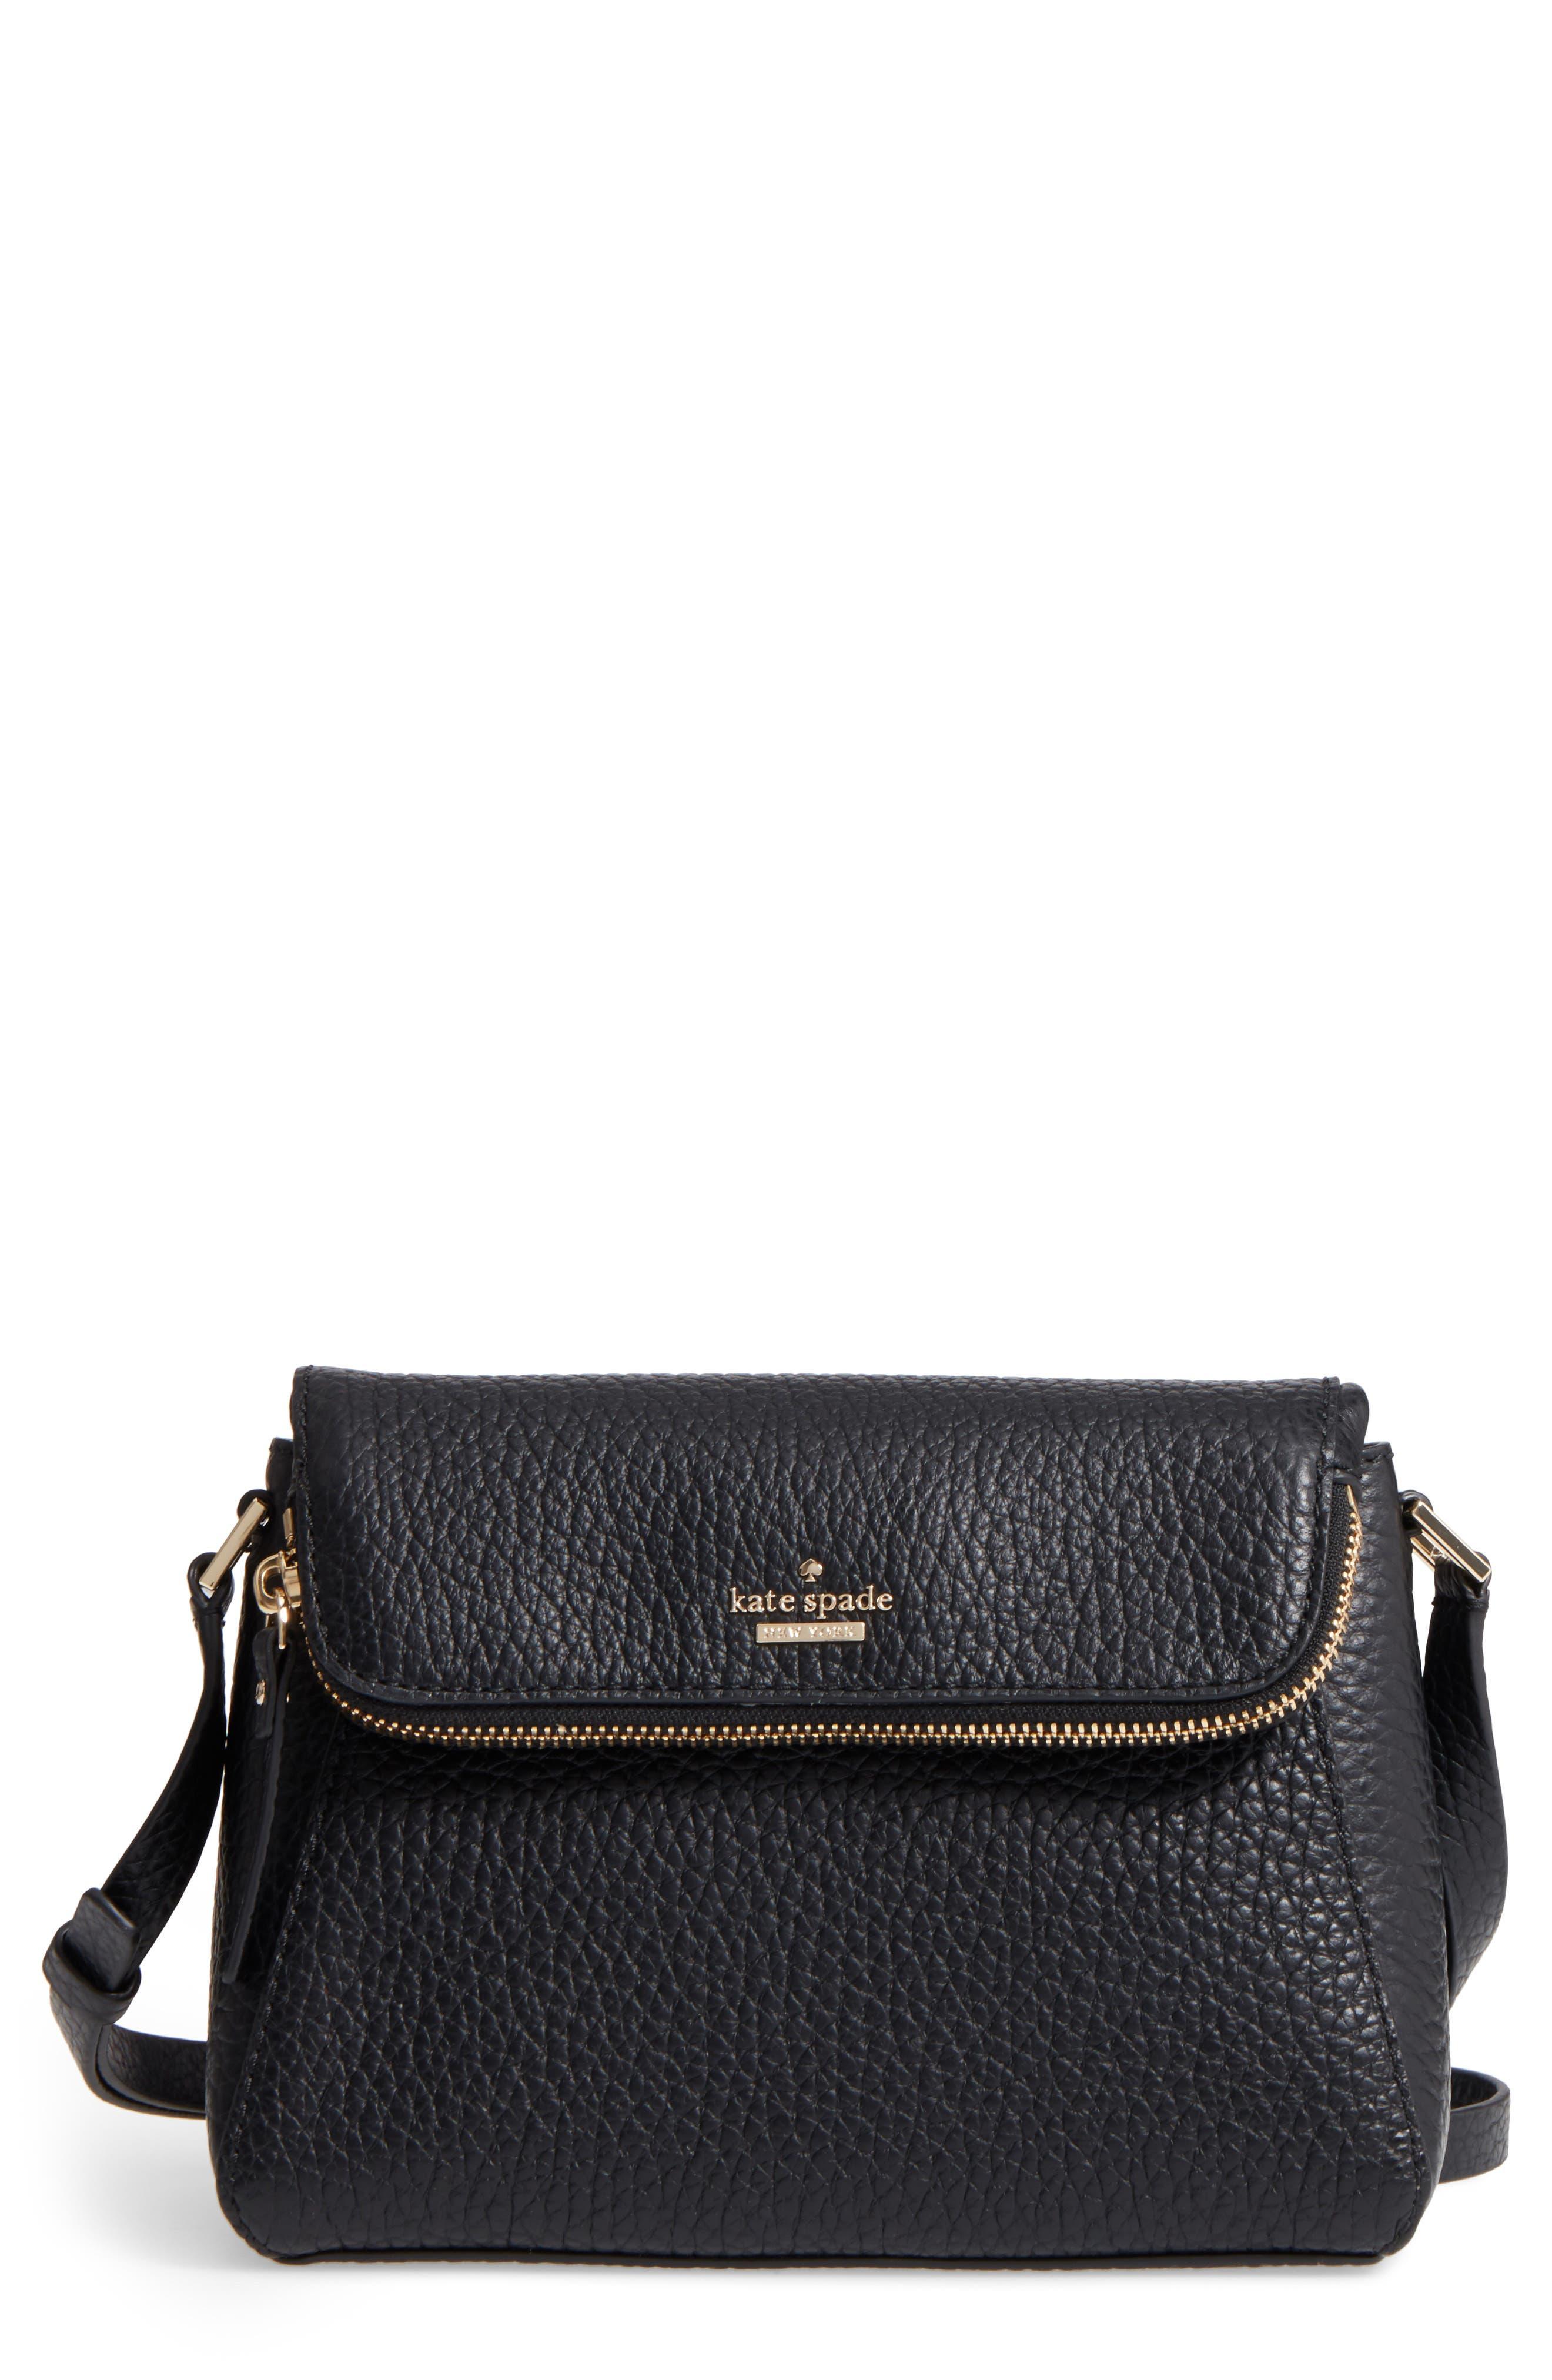 Alternate Image 1 Selected - kate spade new york carter street - berrin leather crossbody bag